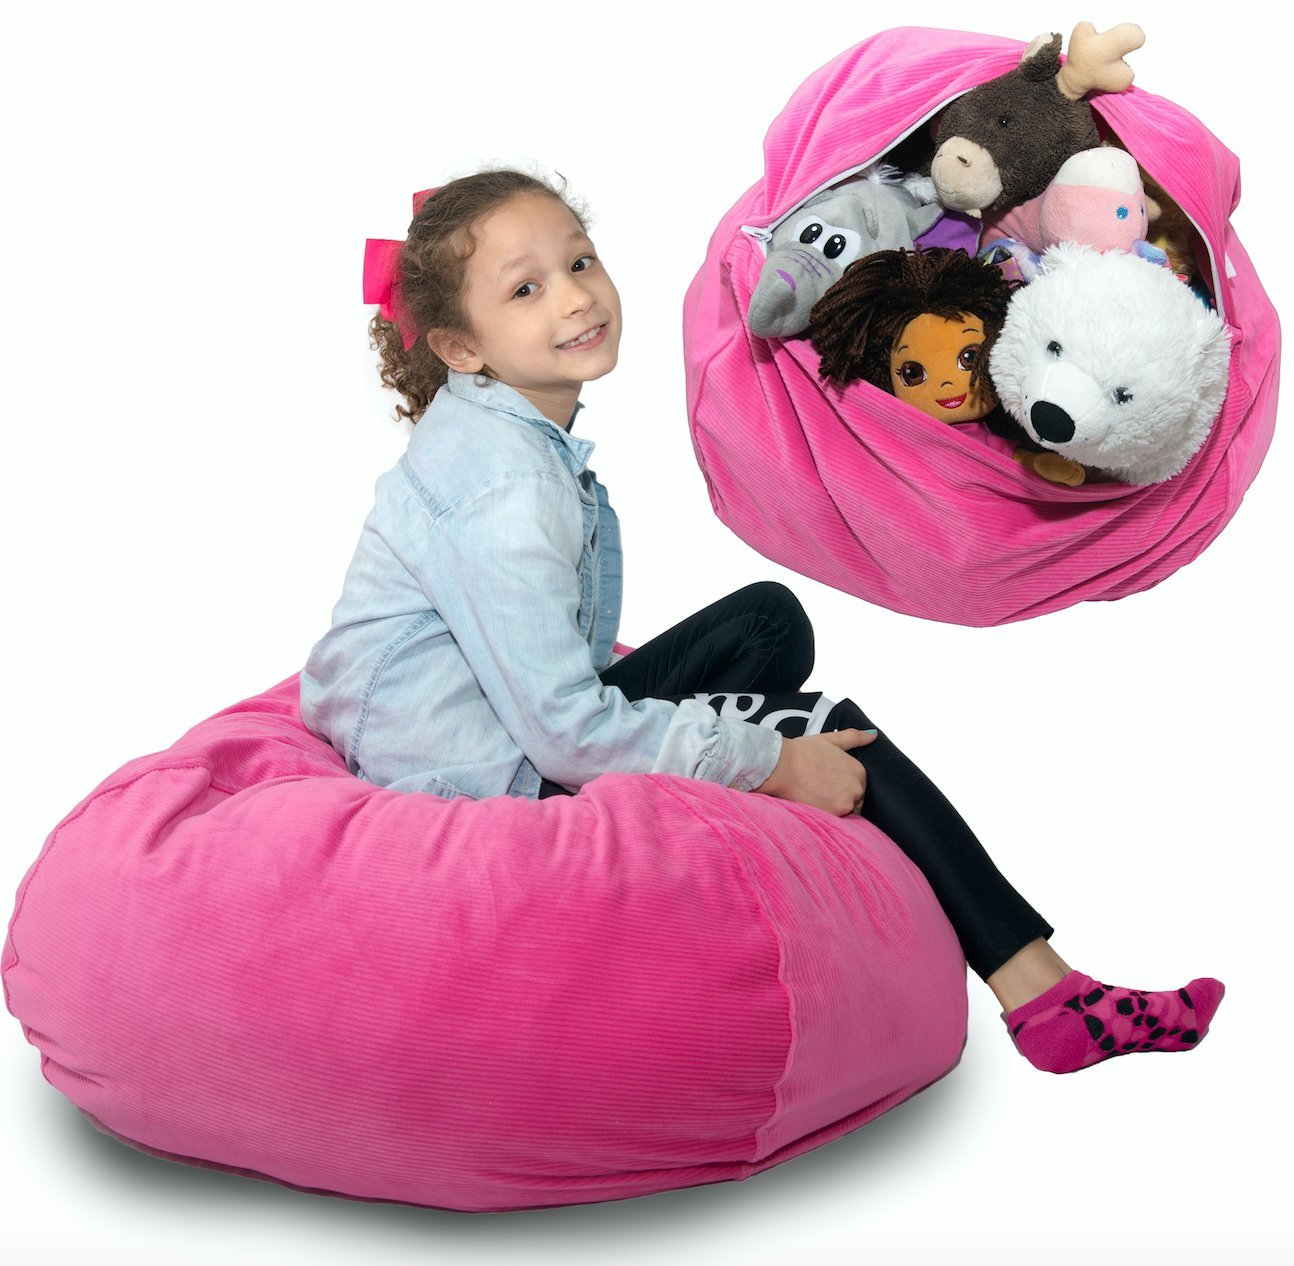 LARGE SUPER SOFT Stuffed Animal Storage Bean Bag Chair